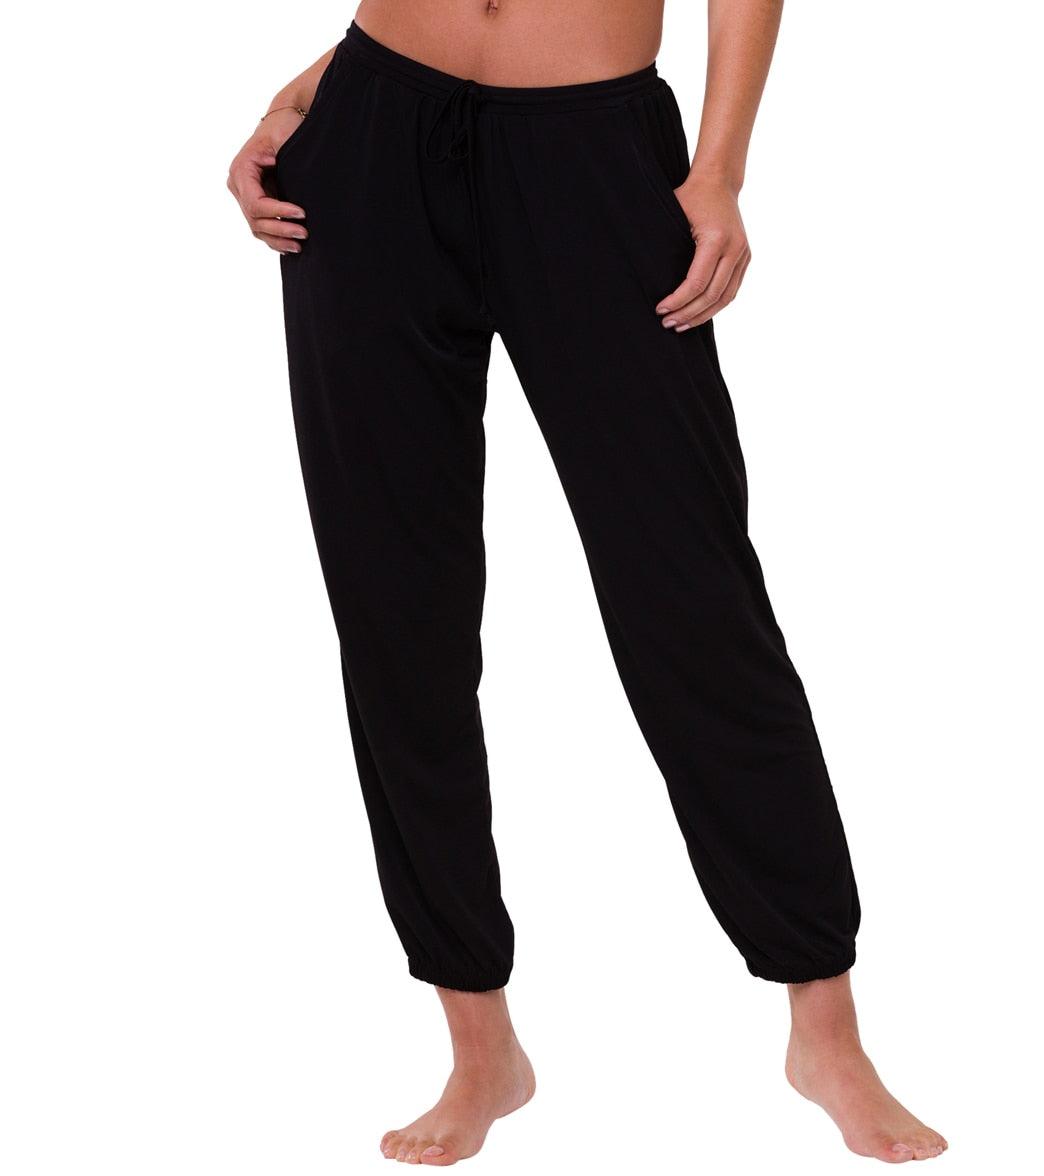 Onzie Women's Fleece Sweatpants - Black ML Spandex